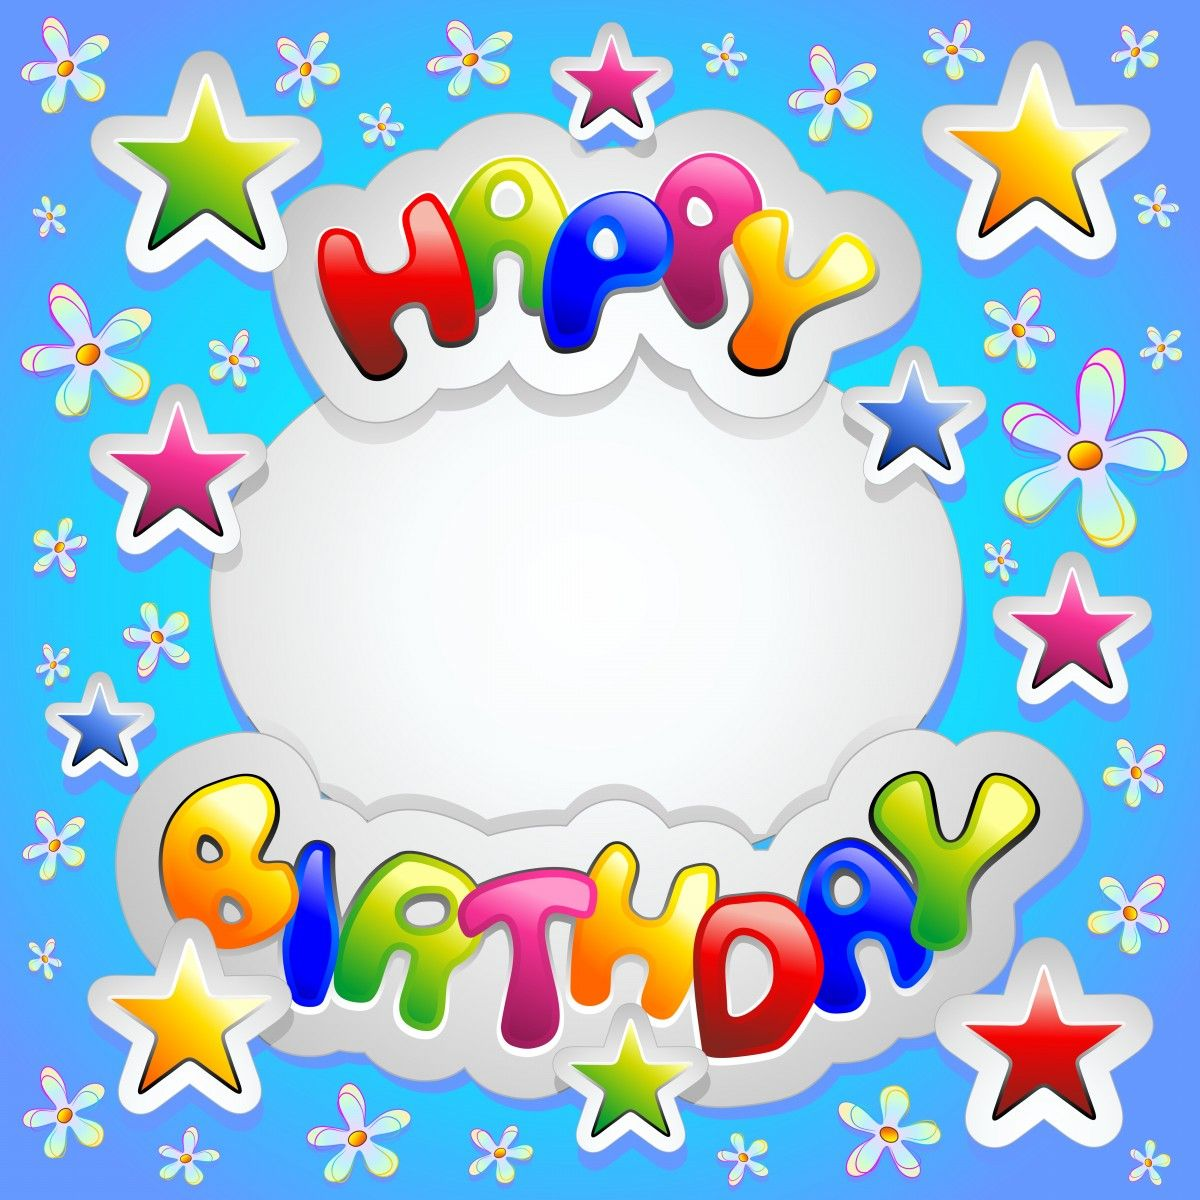 Happy 12th Lauren Birthday wishes for kids, Happy